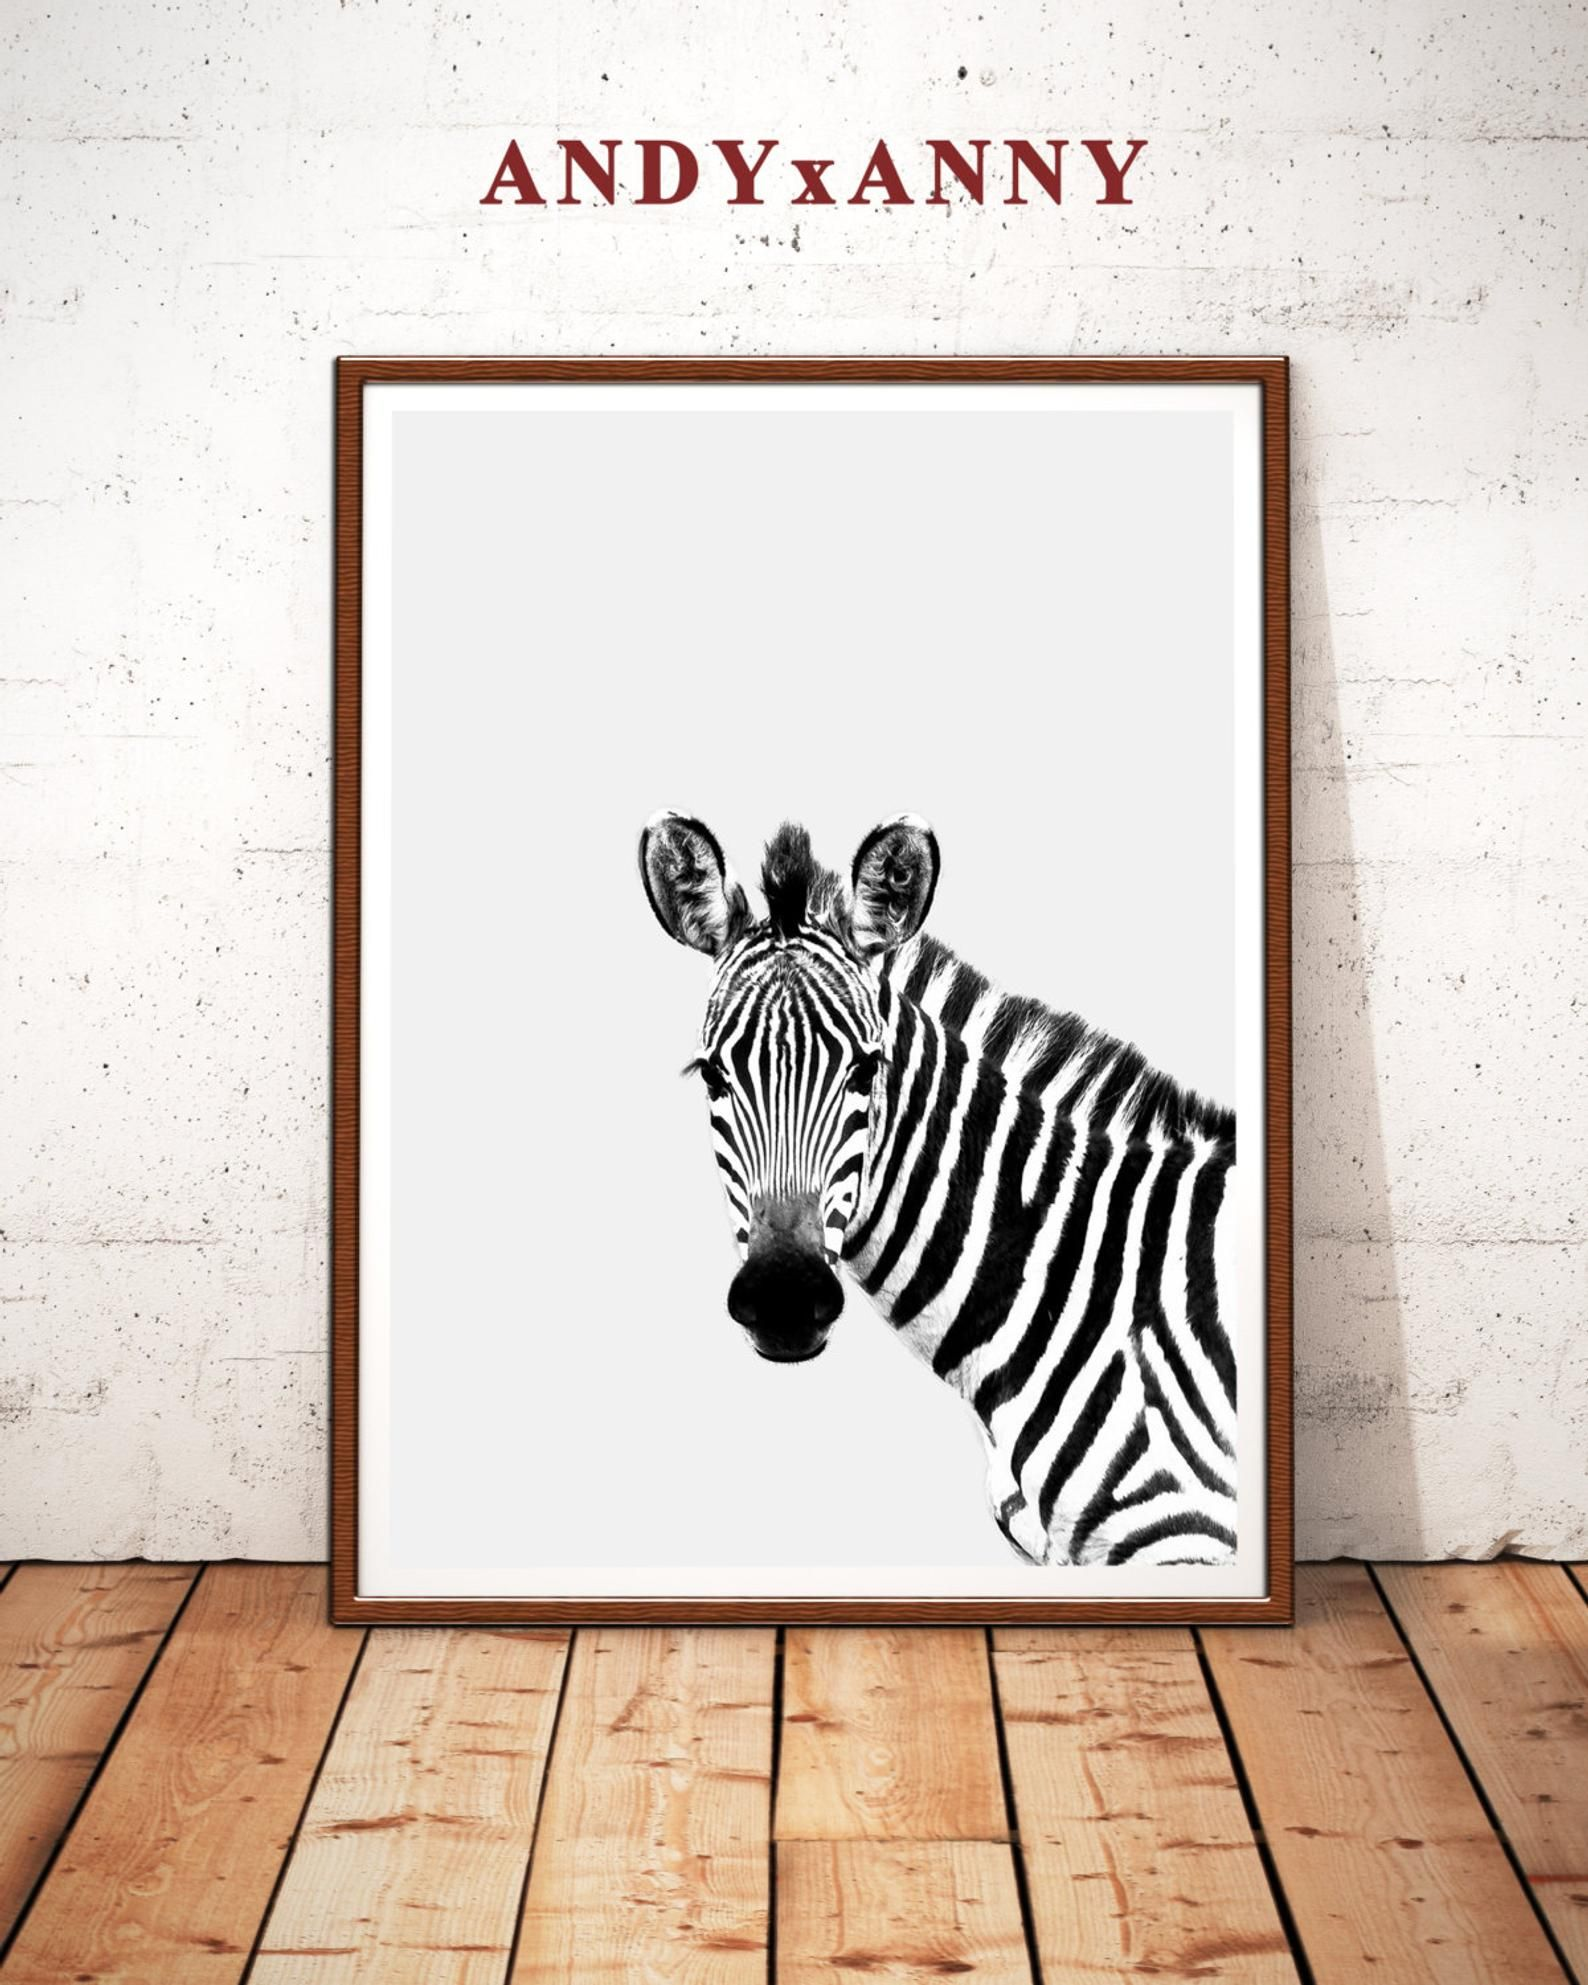 Zebra Print Zebra Prints Zebra Printable Art Zebra Etsy In 2021 Zebra Art Zebra Wall Art Zebra Drawing